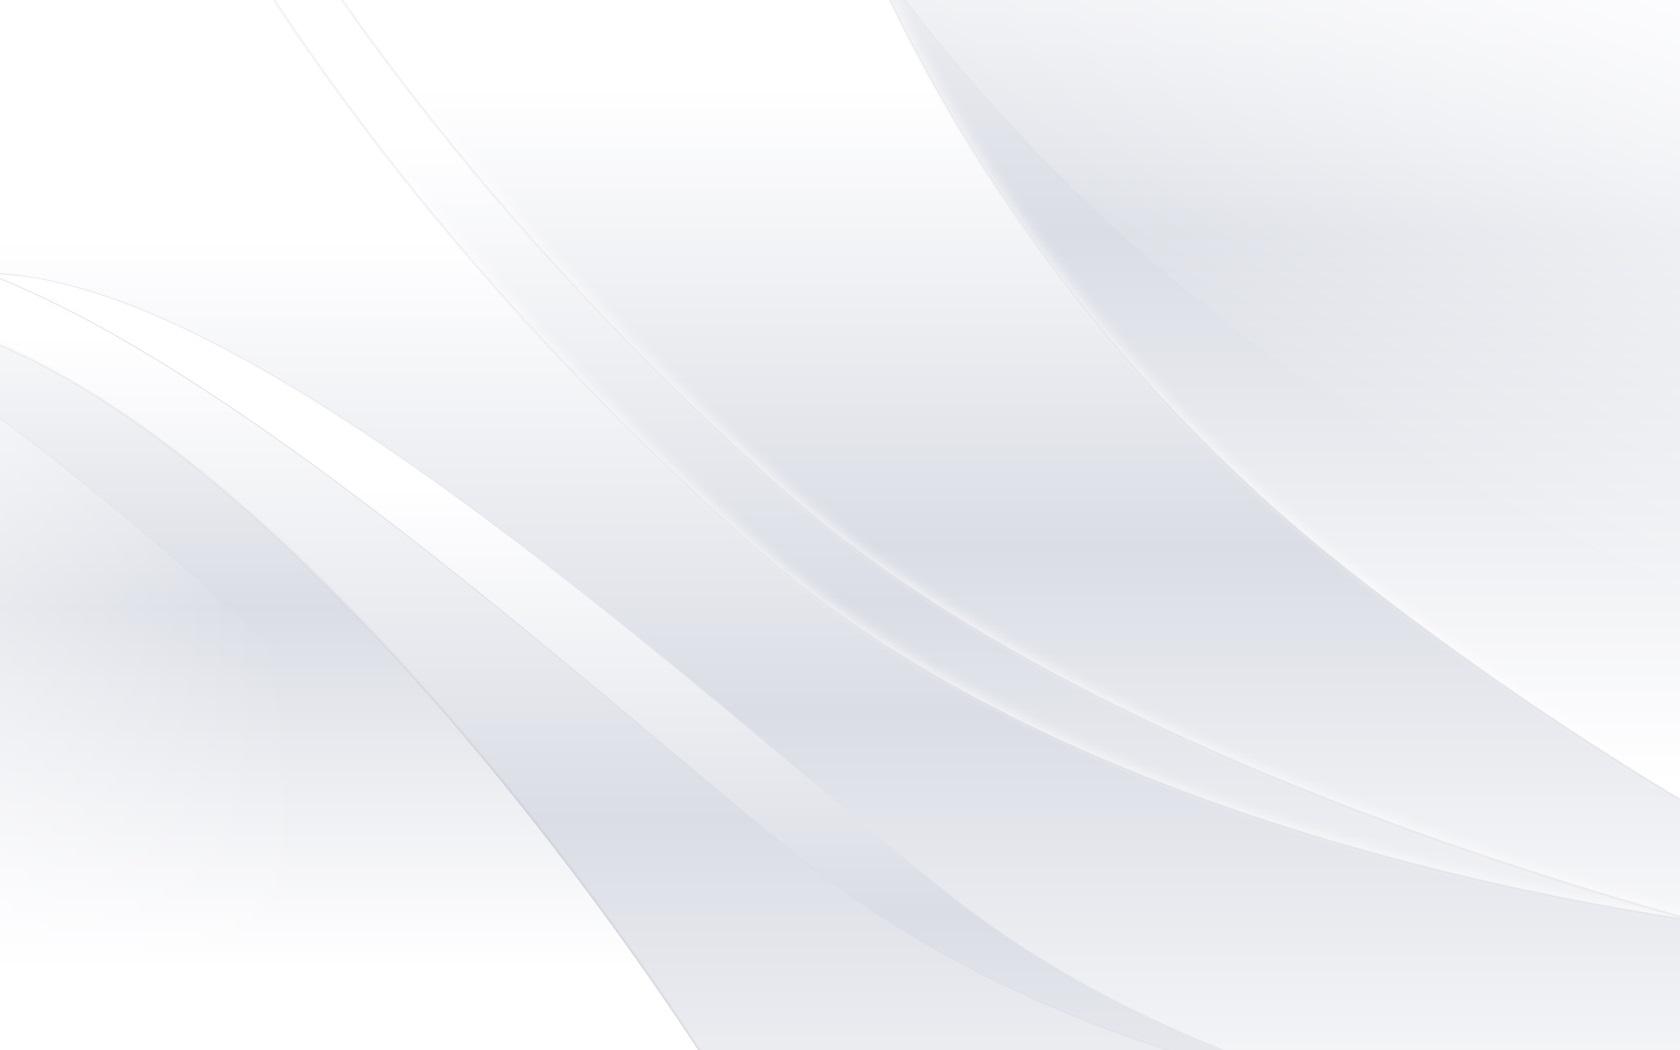 white hd silver image